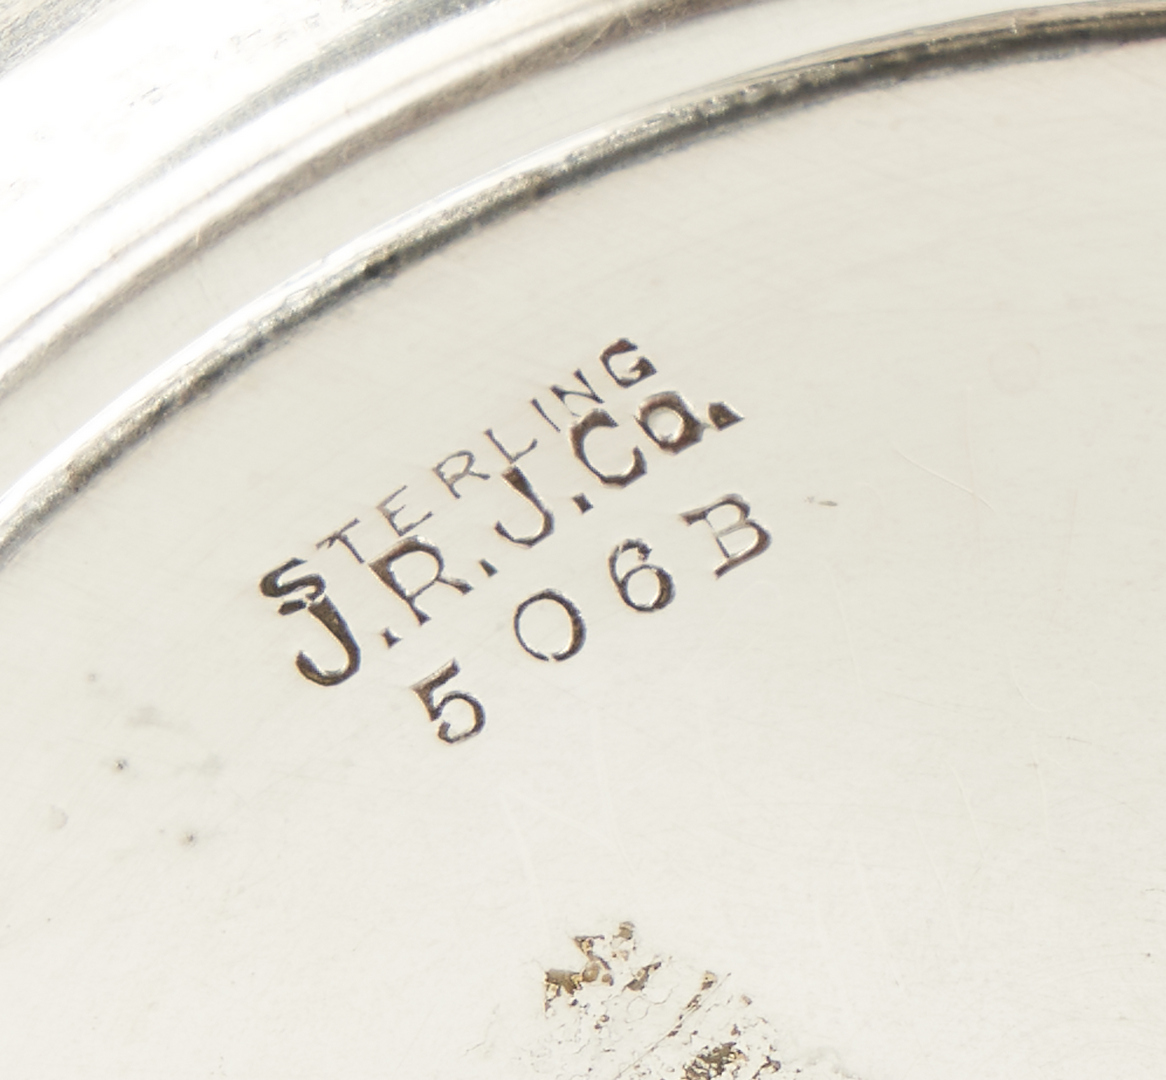 Lot 921: J.R.J. Co. Sterling Silver Water Pitcher